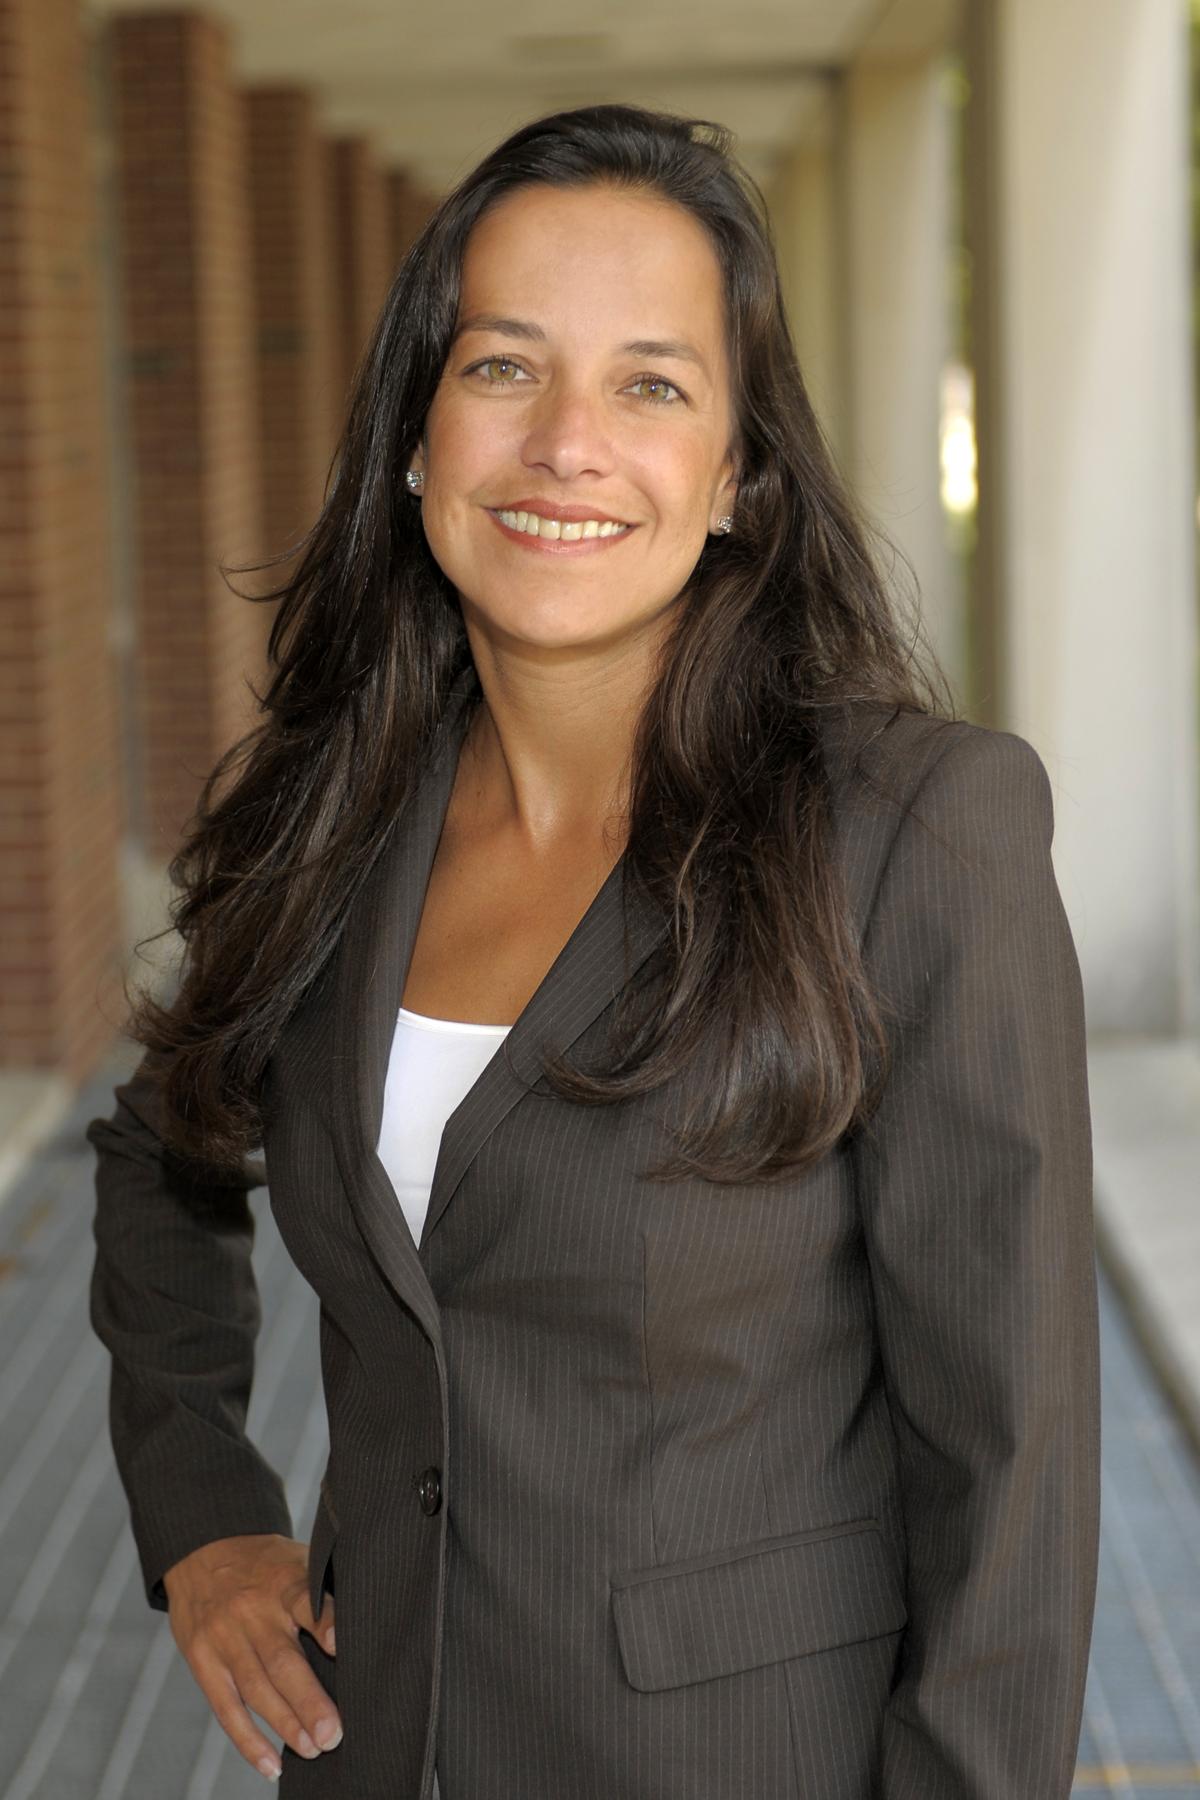 Melissa Wasserman